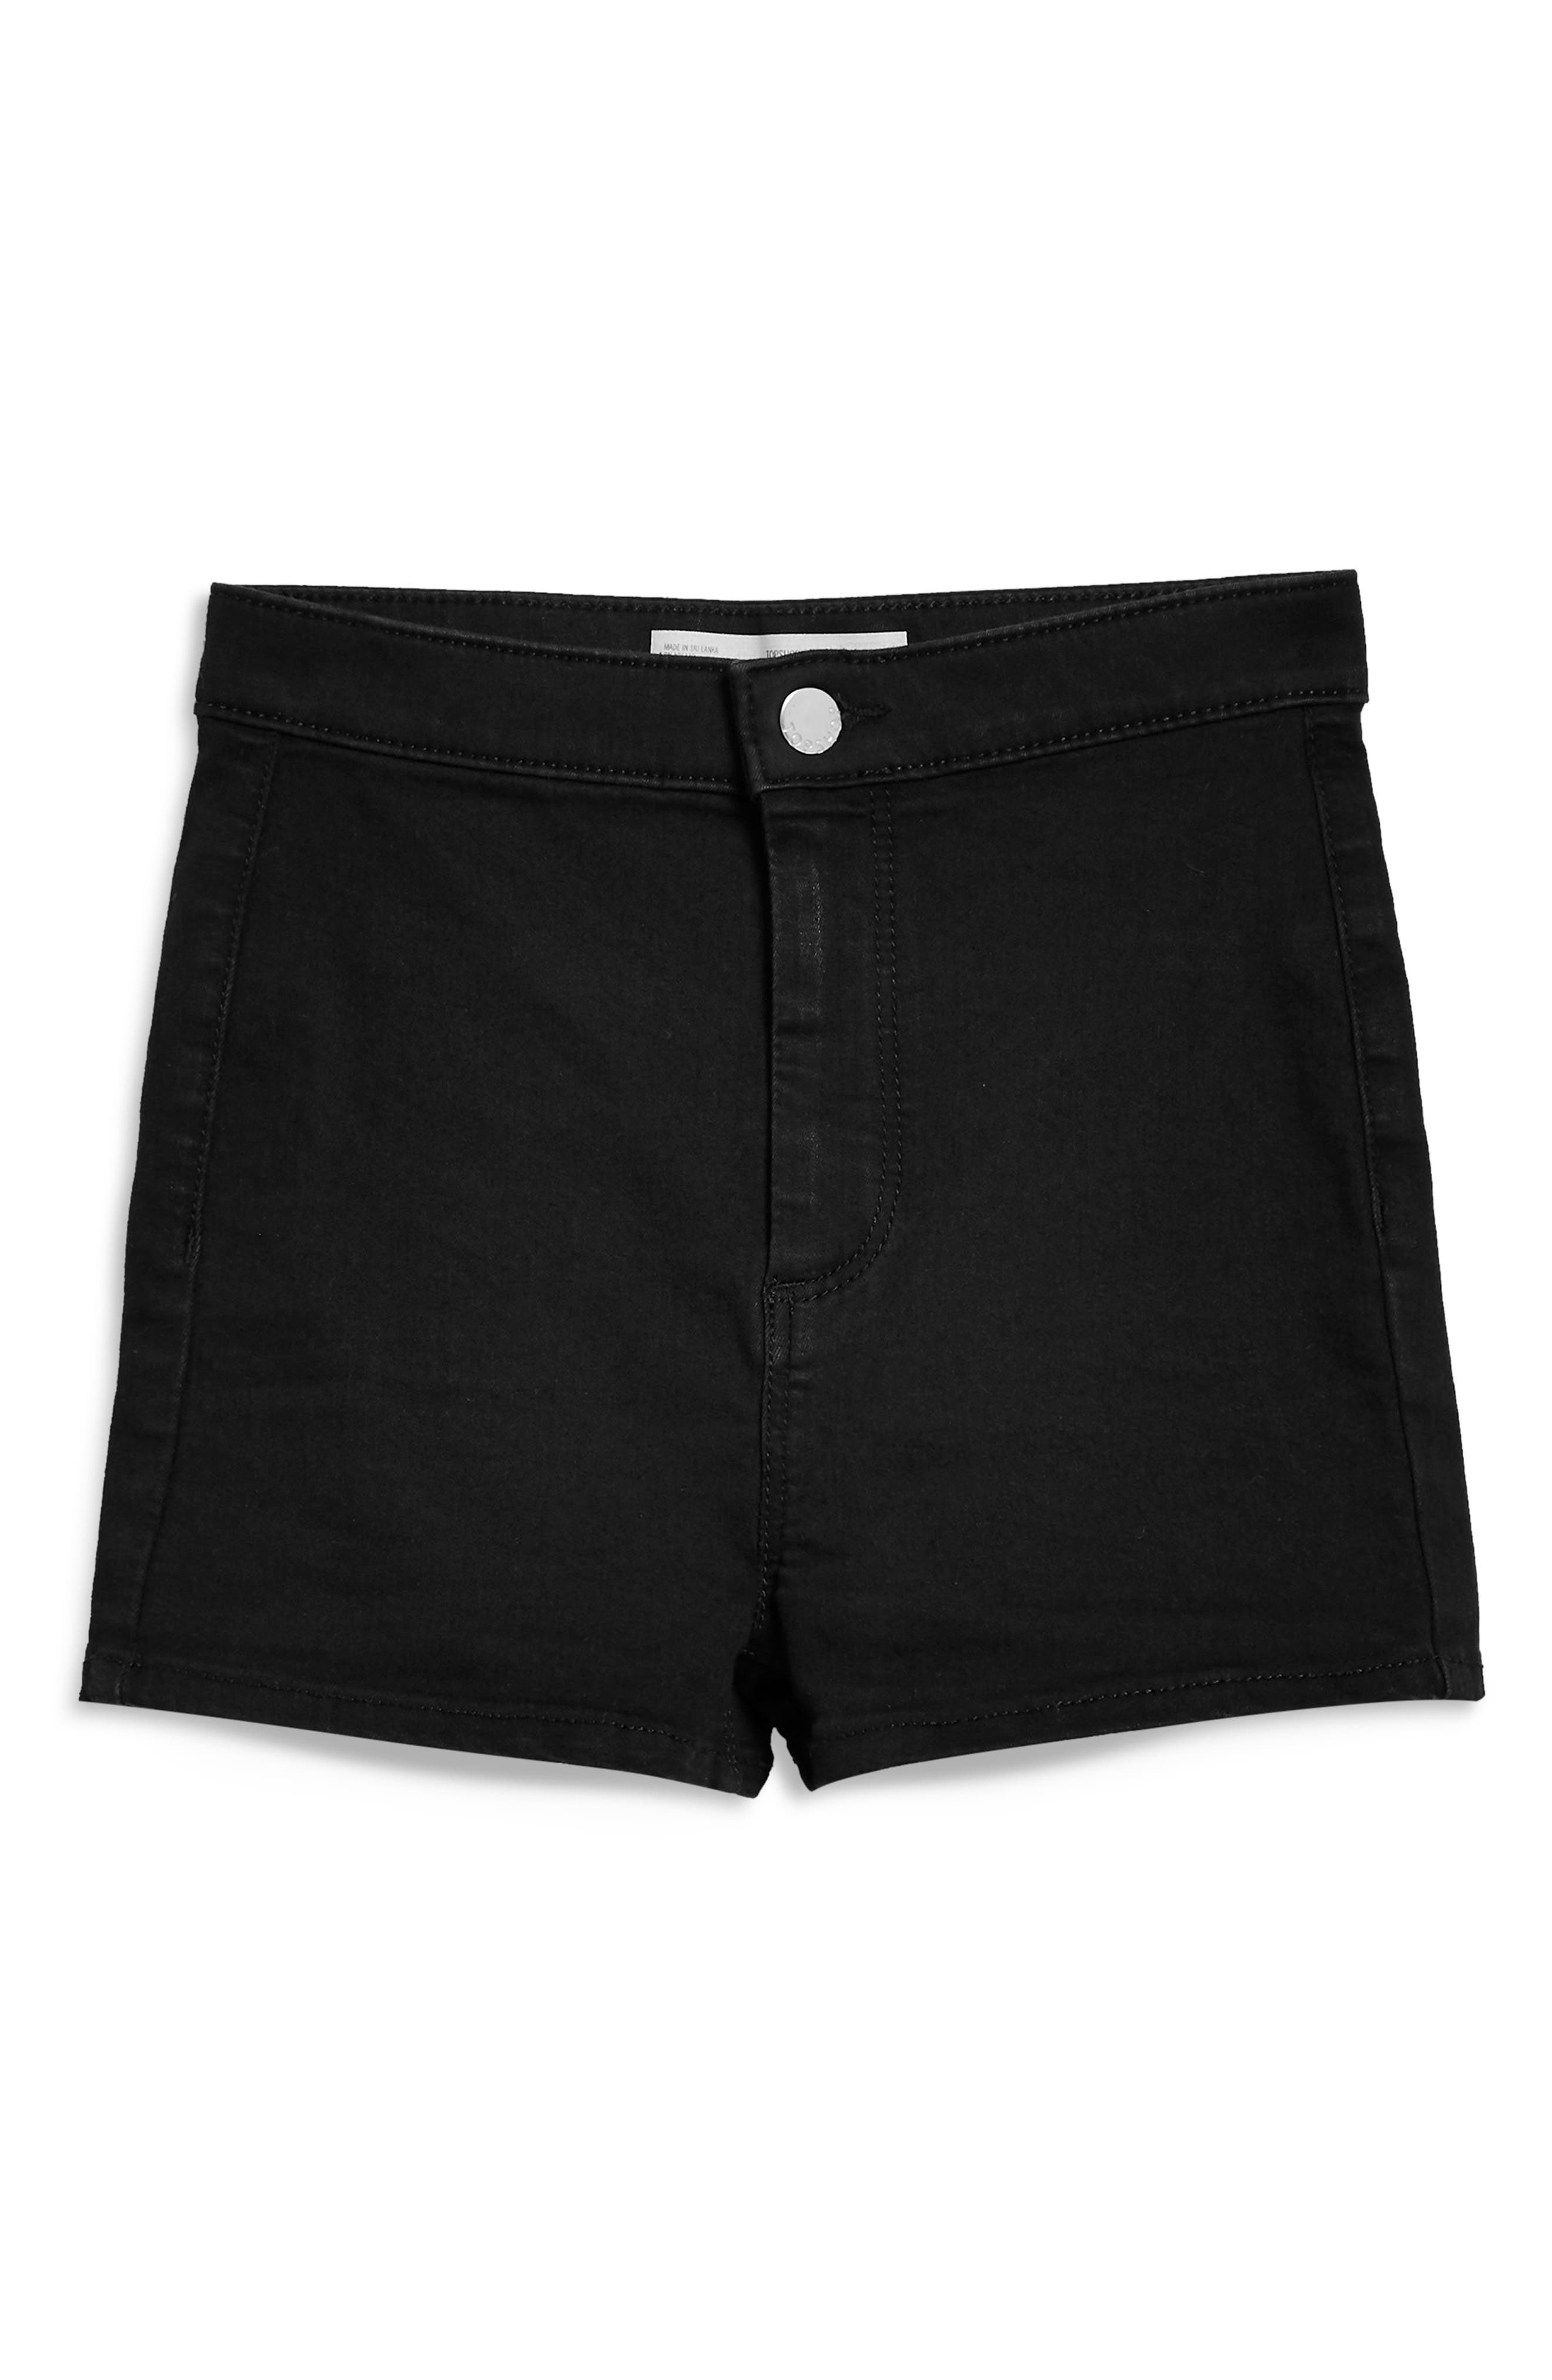 TOPSHOP, Joni High Waist Denim Shorts, Alternate thumbnail 4, color, BLACK